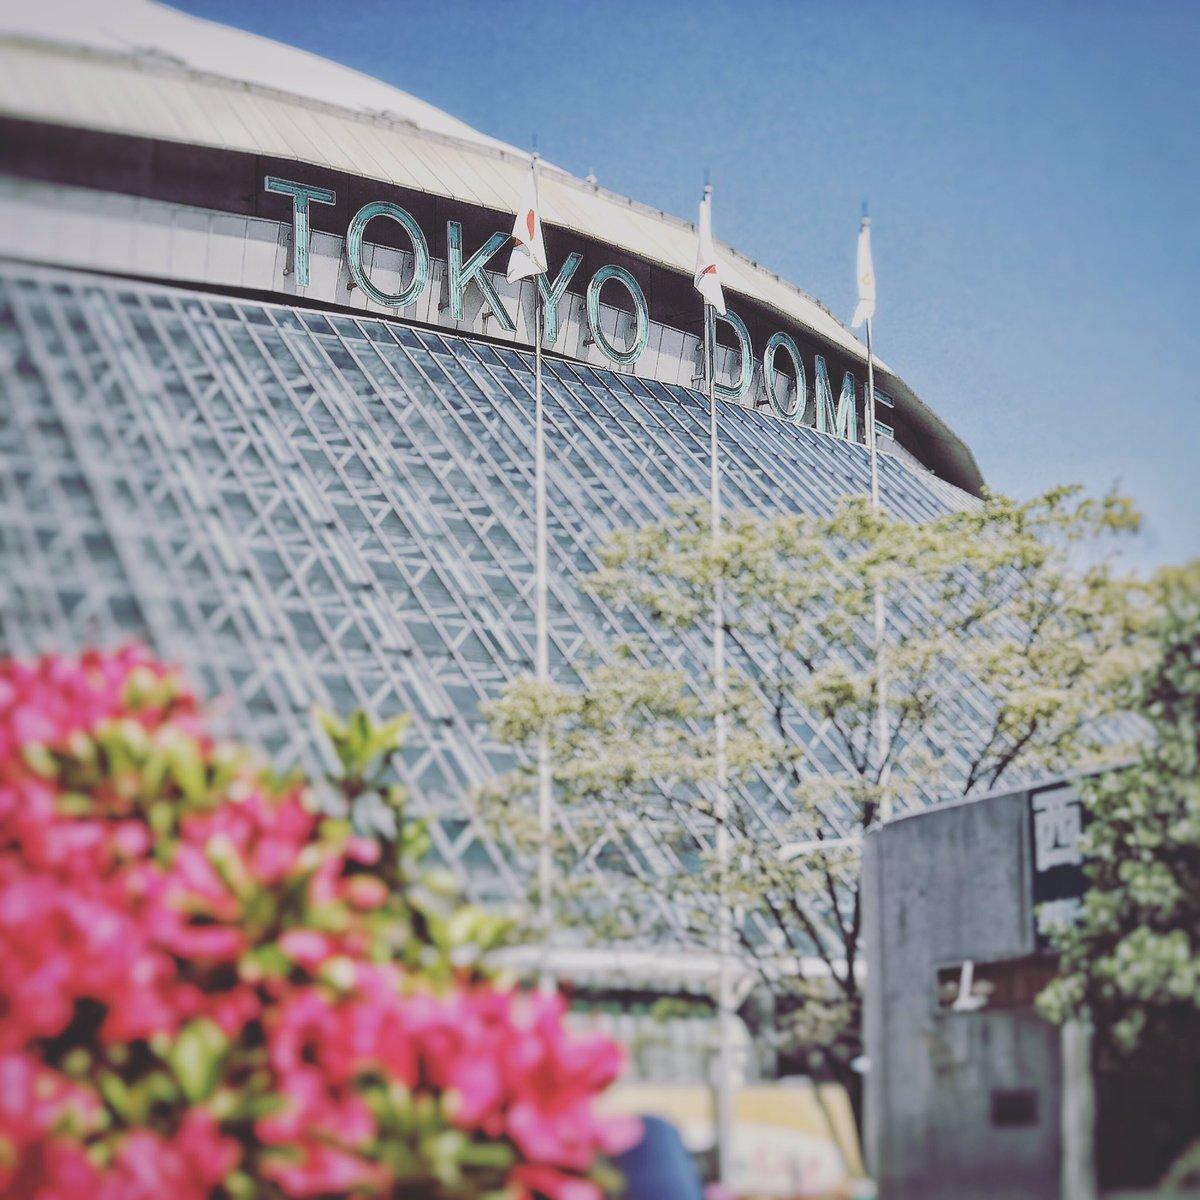 Konichiwa Tokyo!  R42 #ColdplayTokyo #AHFODTour